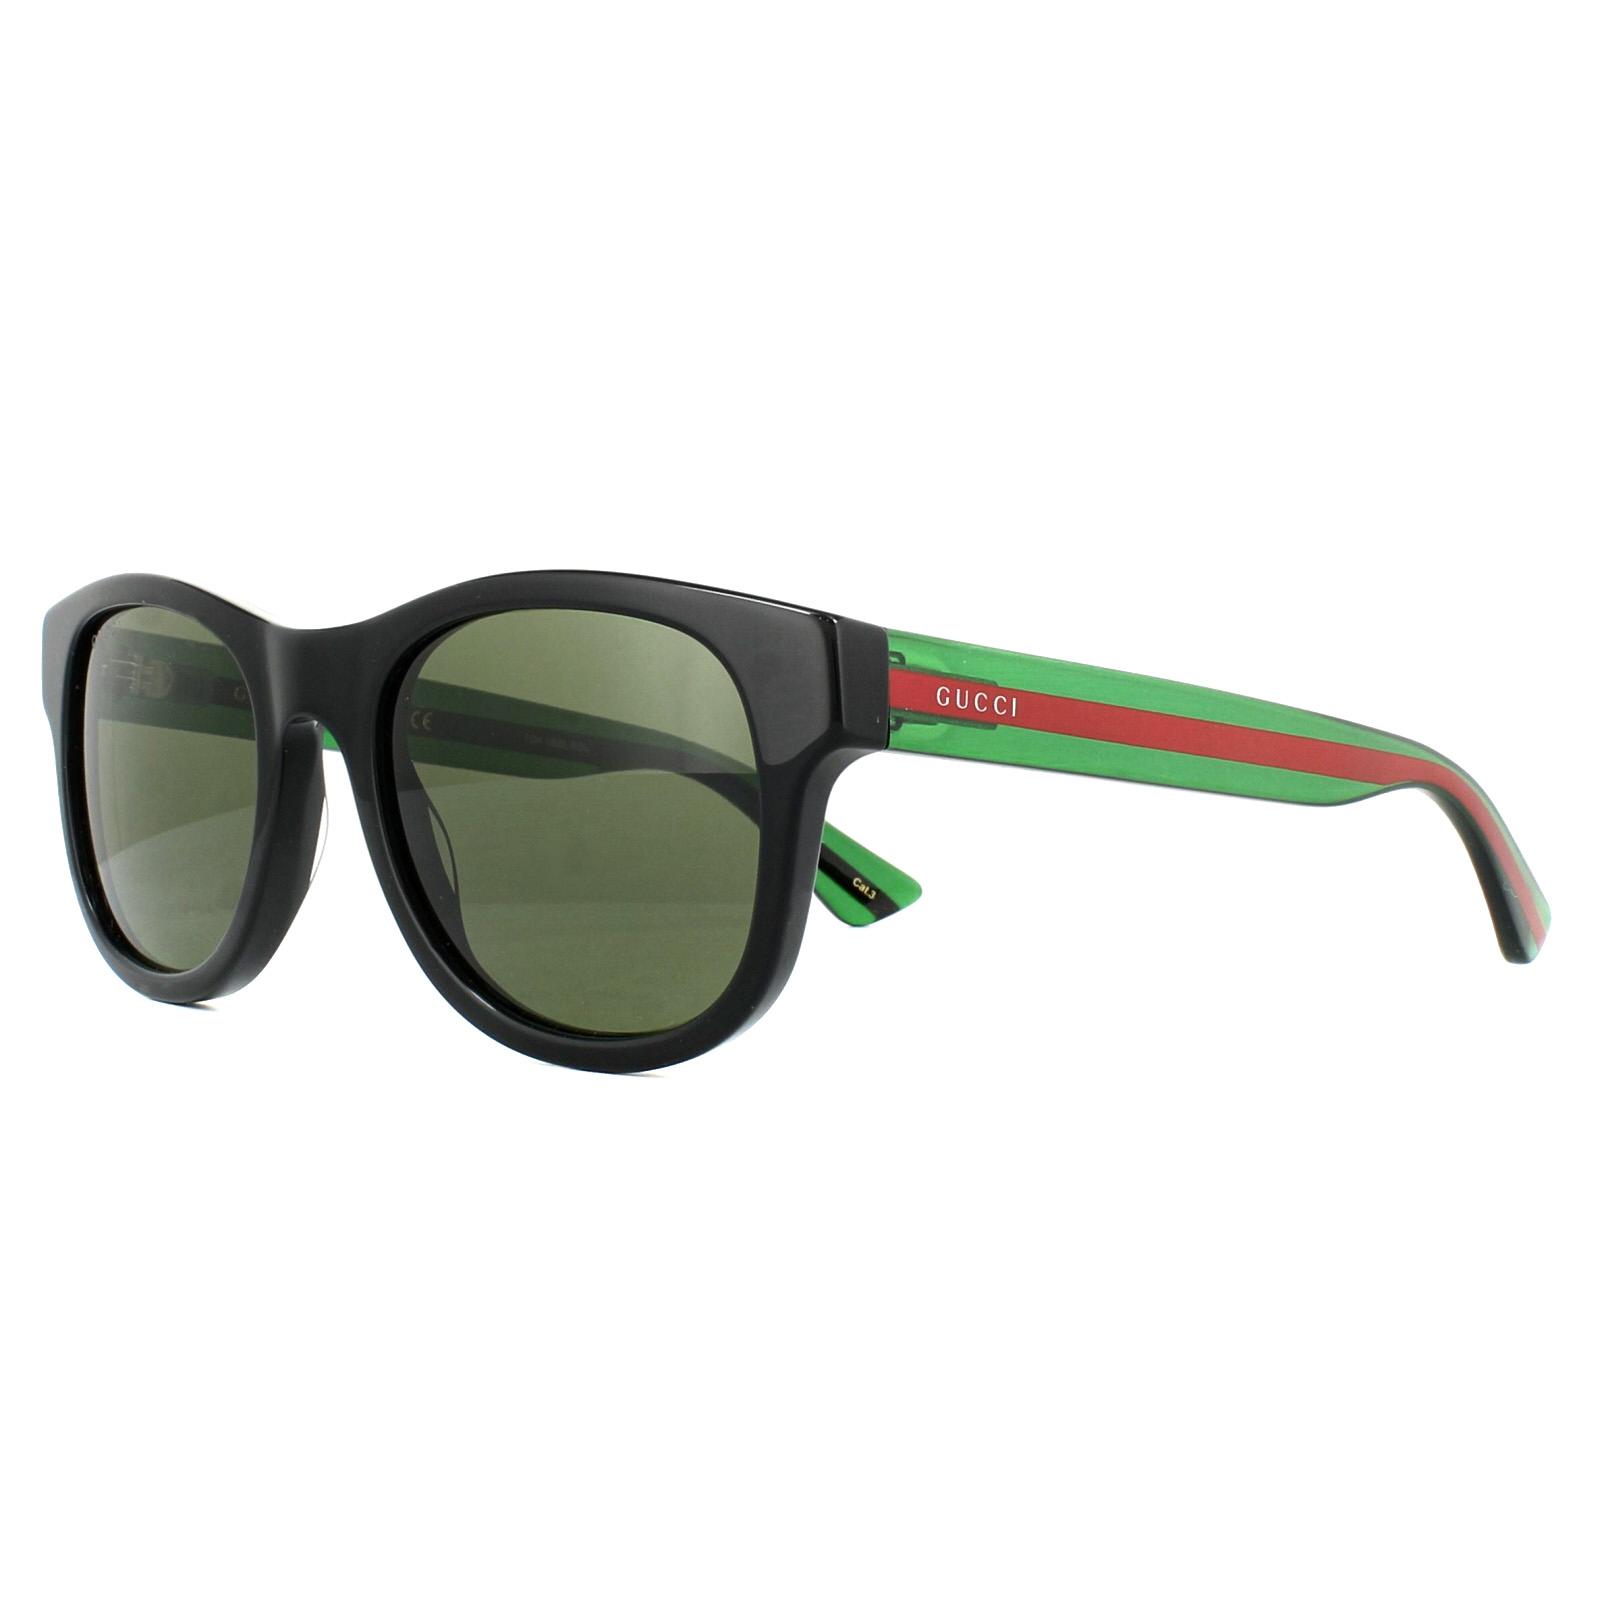 9ab99f03b242 Gucci Sunglasses GG0003S 002 Black Green Red Green 889652047188 | eBay